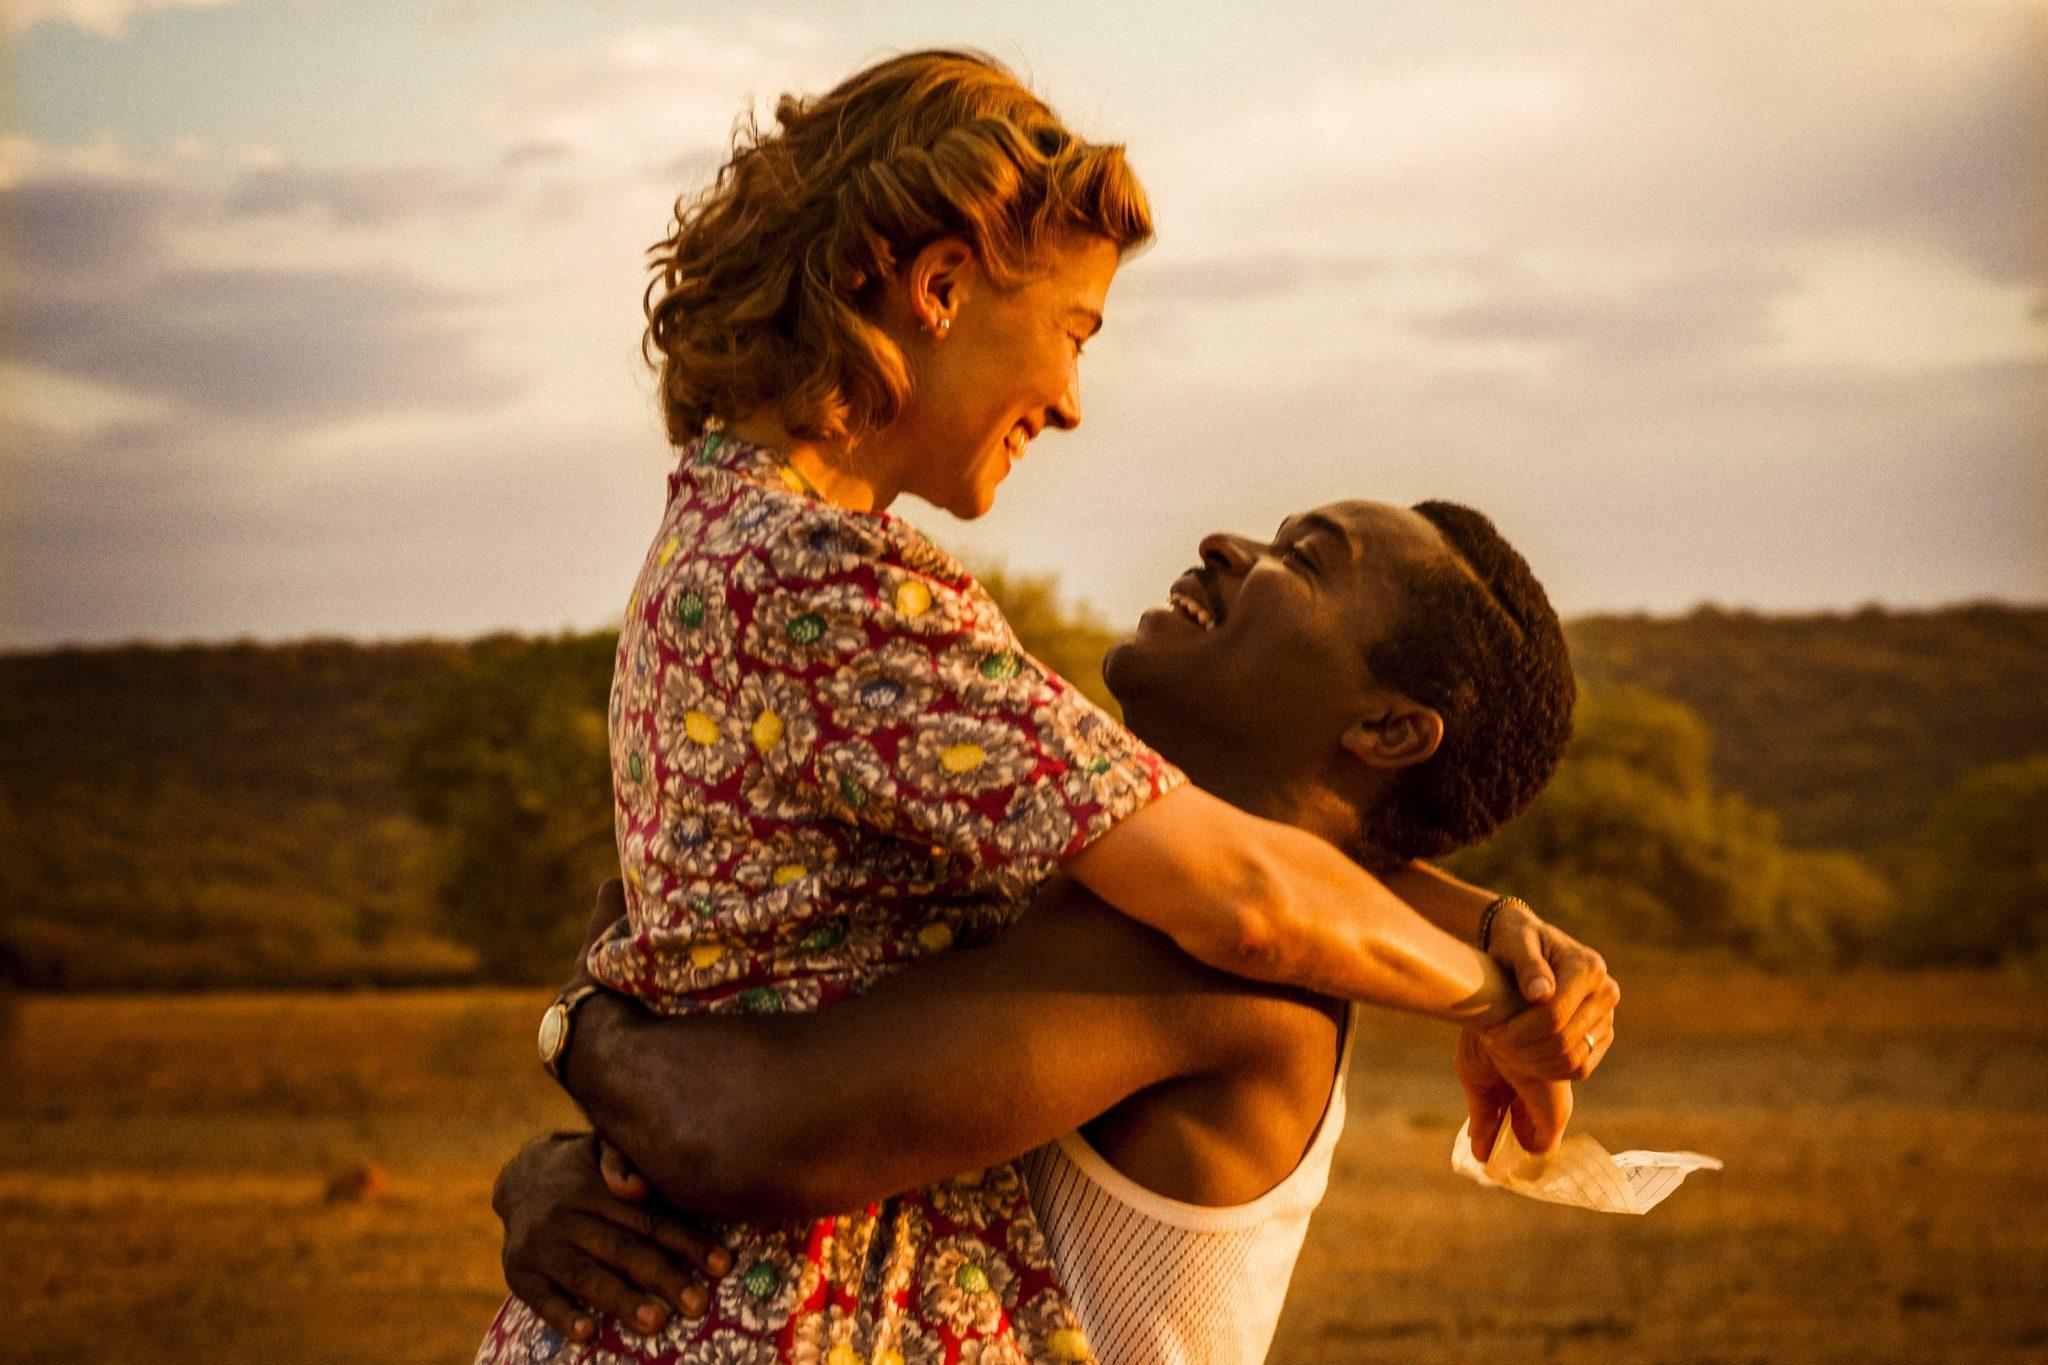 Rosamund Pike (Ruth) and David Oyelowo (Seretse) in A UNITED KINGDOM